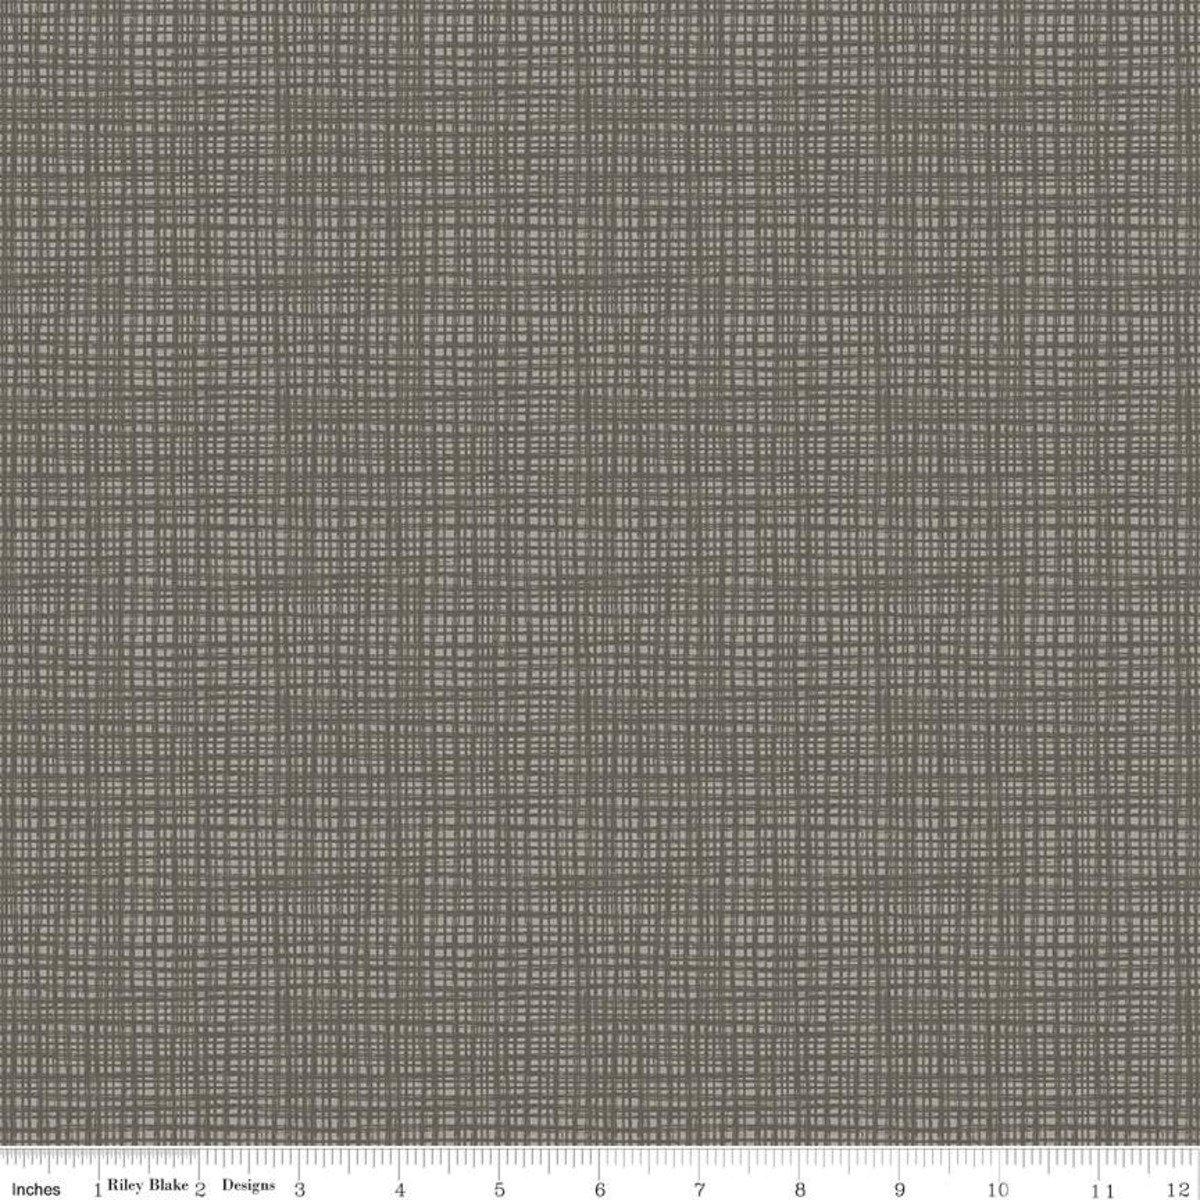 Riley Blake, Texture Basic, OVERCAST